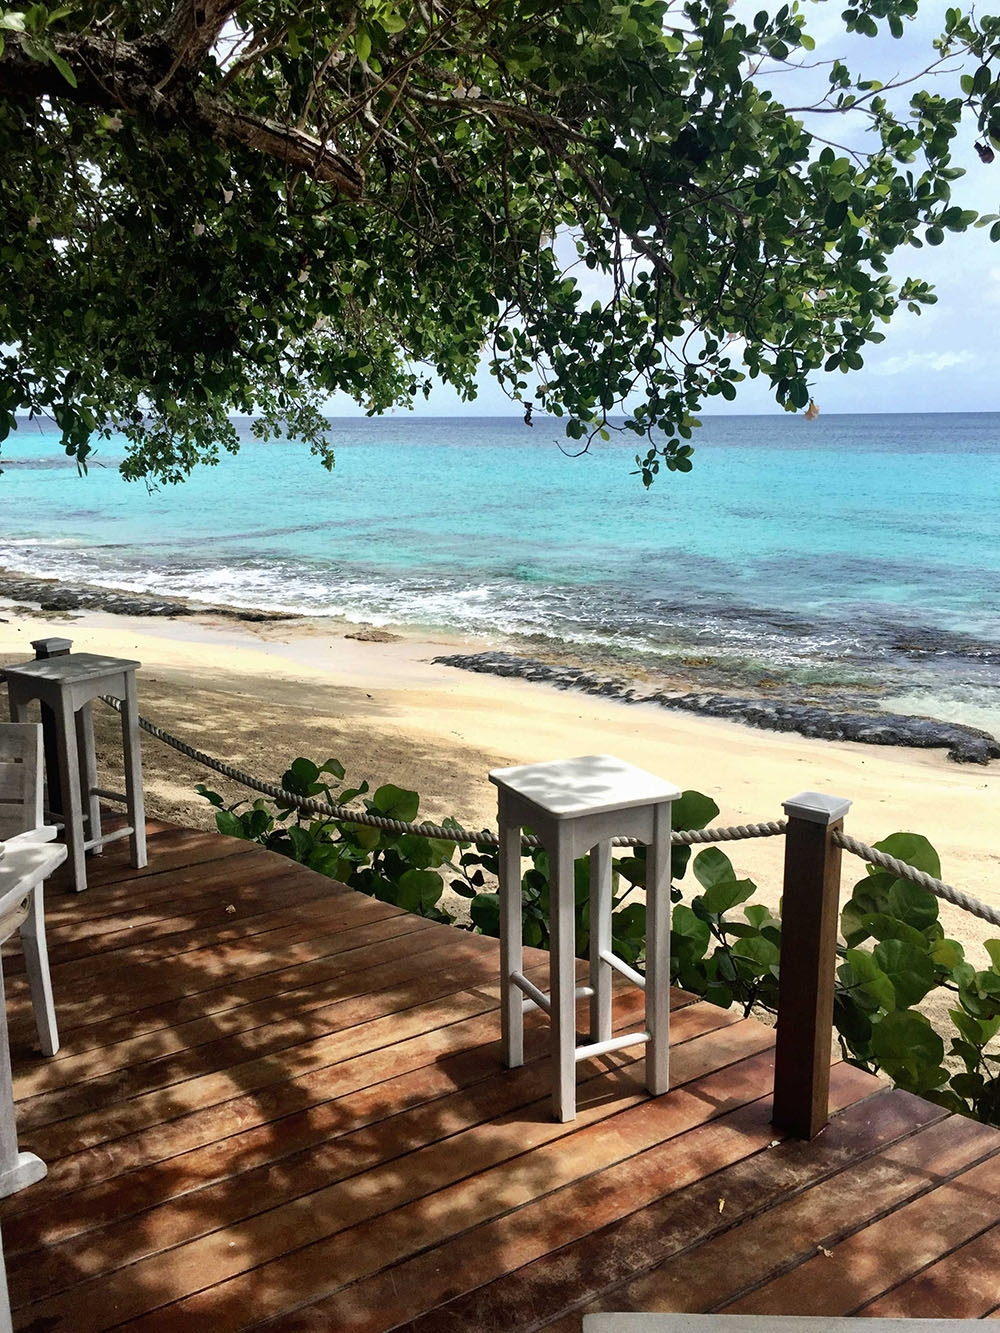 Sitting on a wooden verandah by the Mustique shoreline